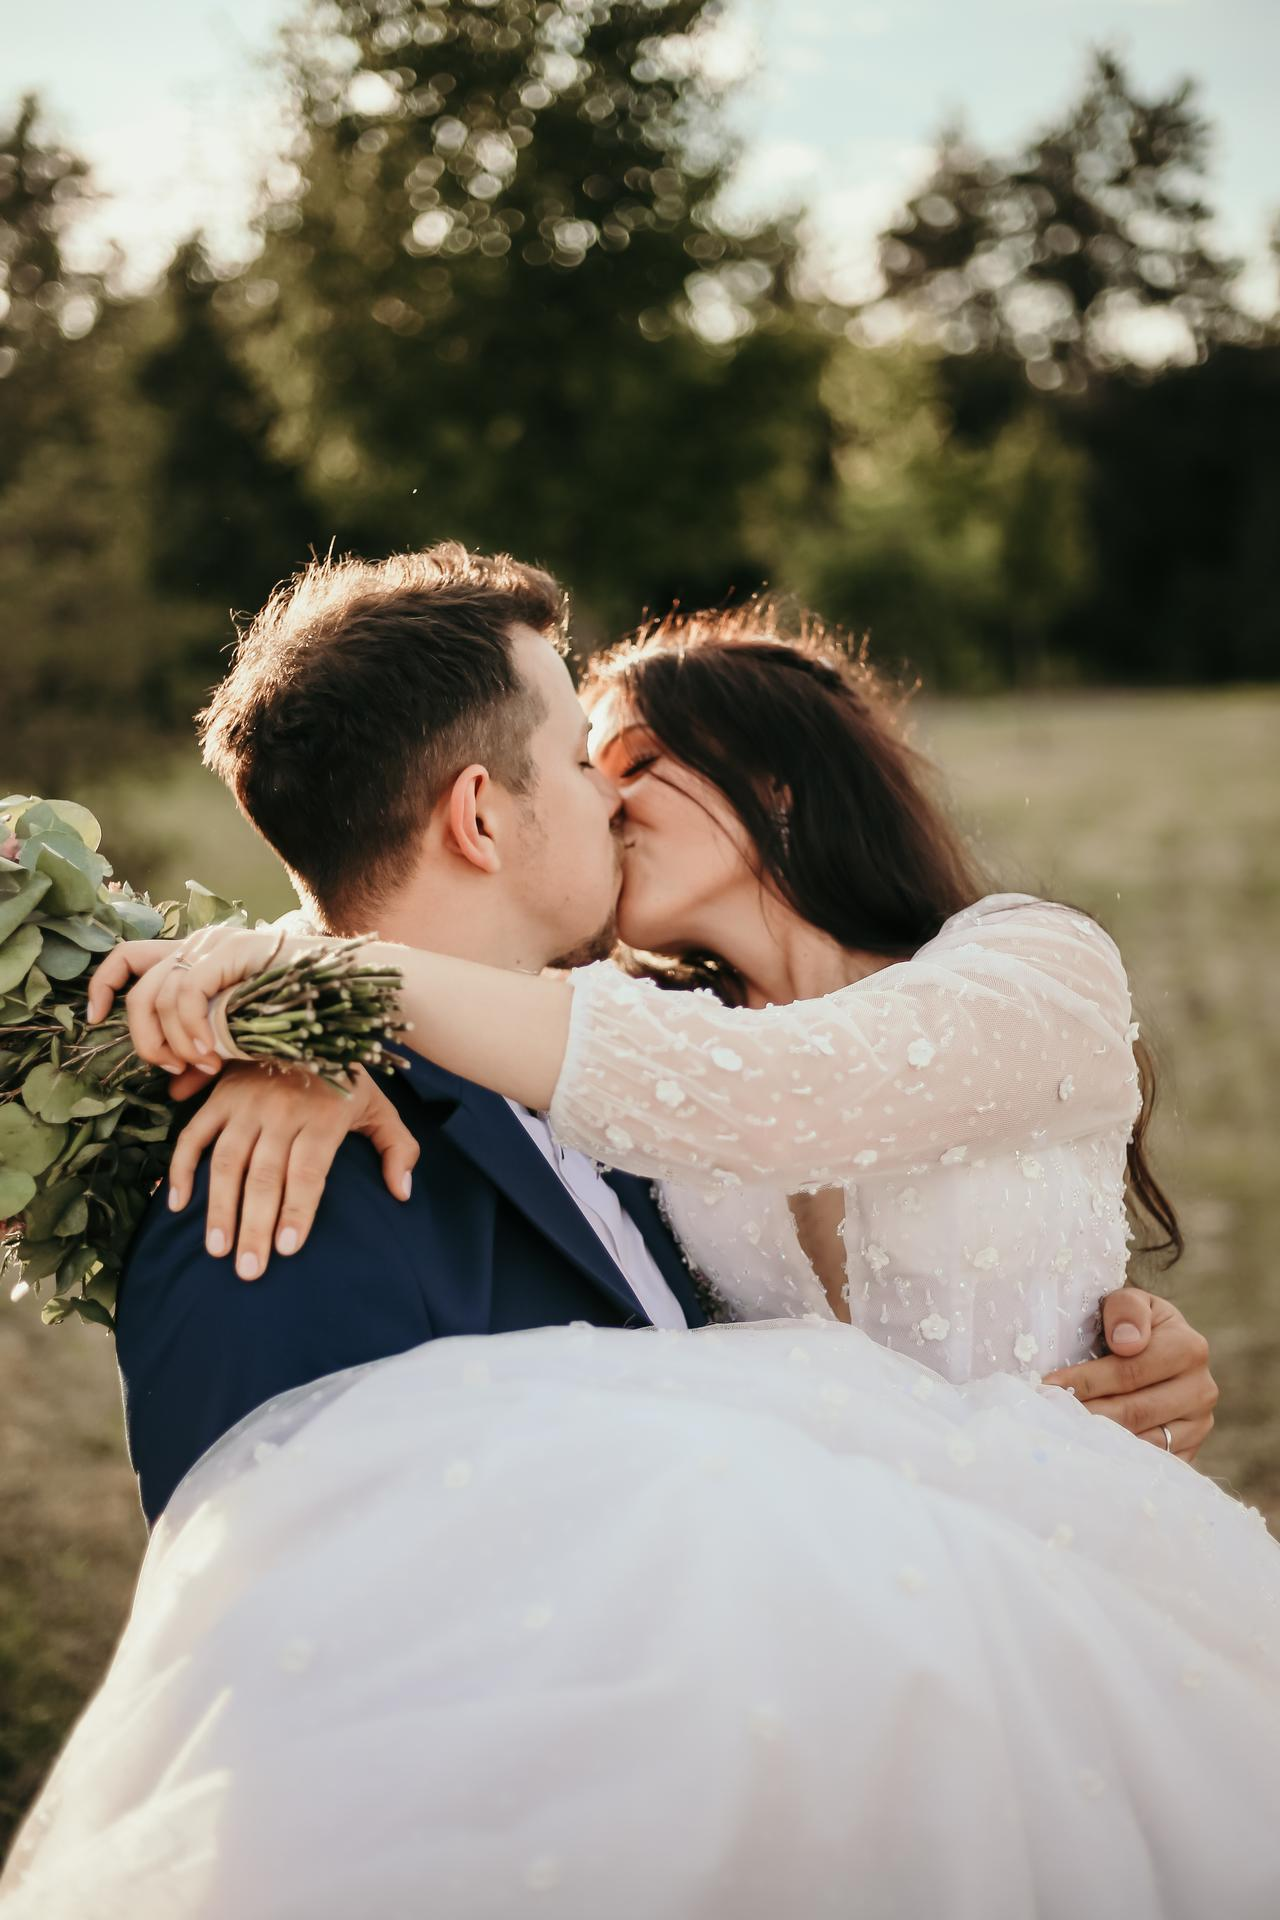 Naše svatba - Obrázek č. 8